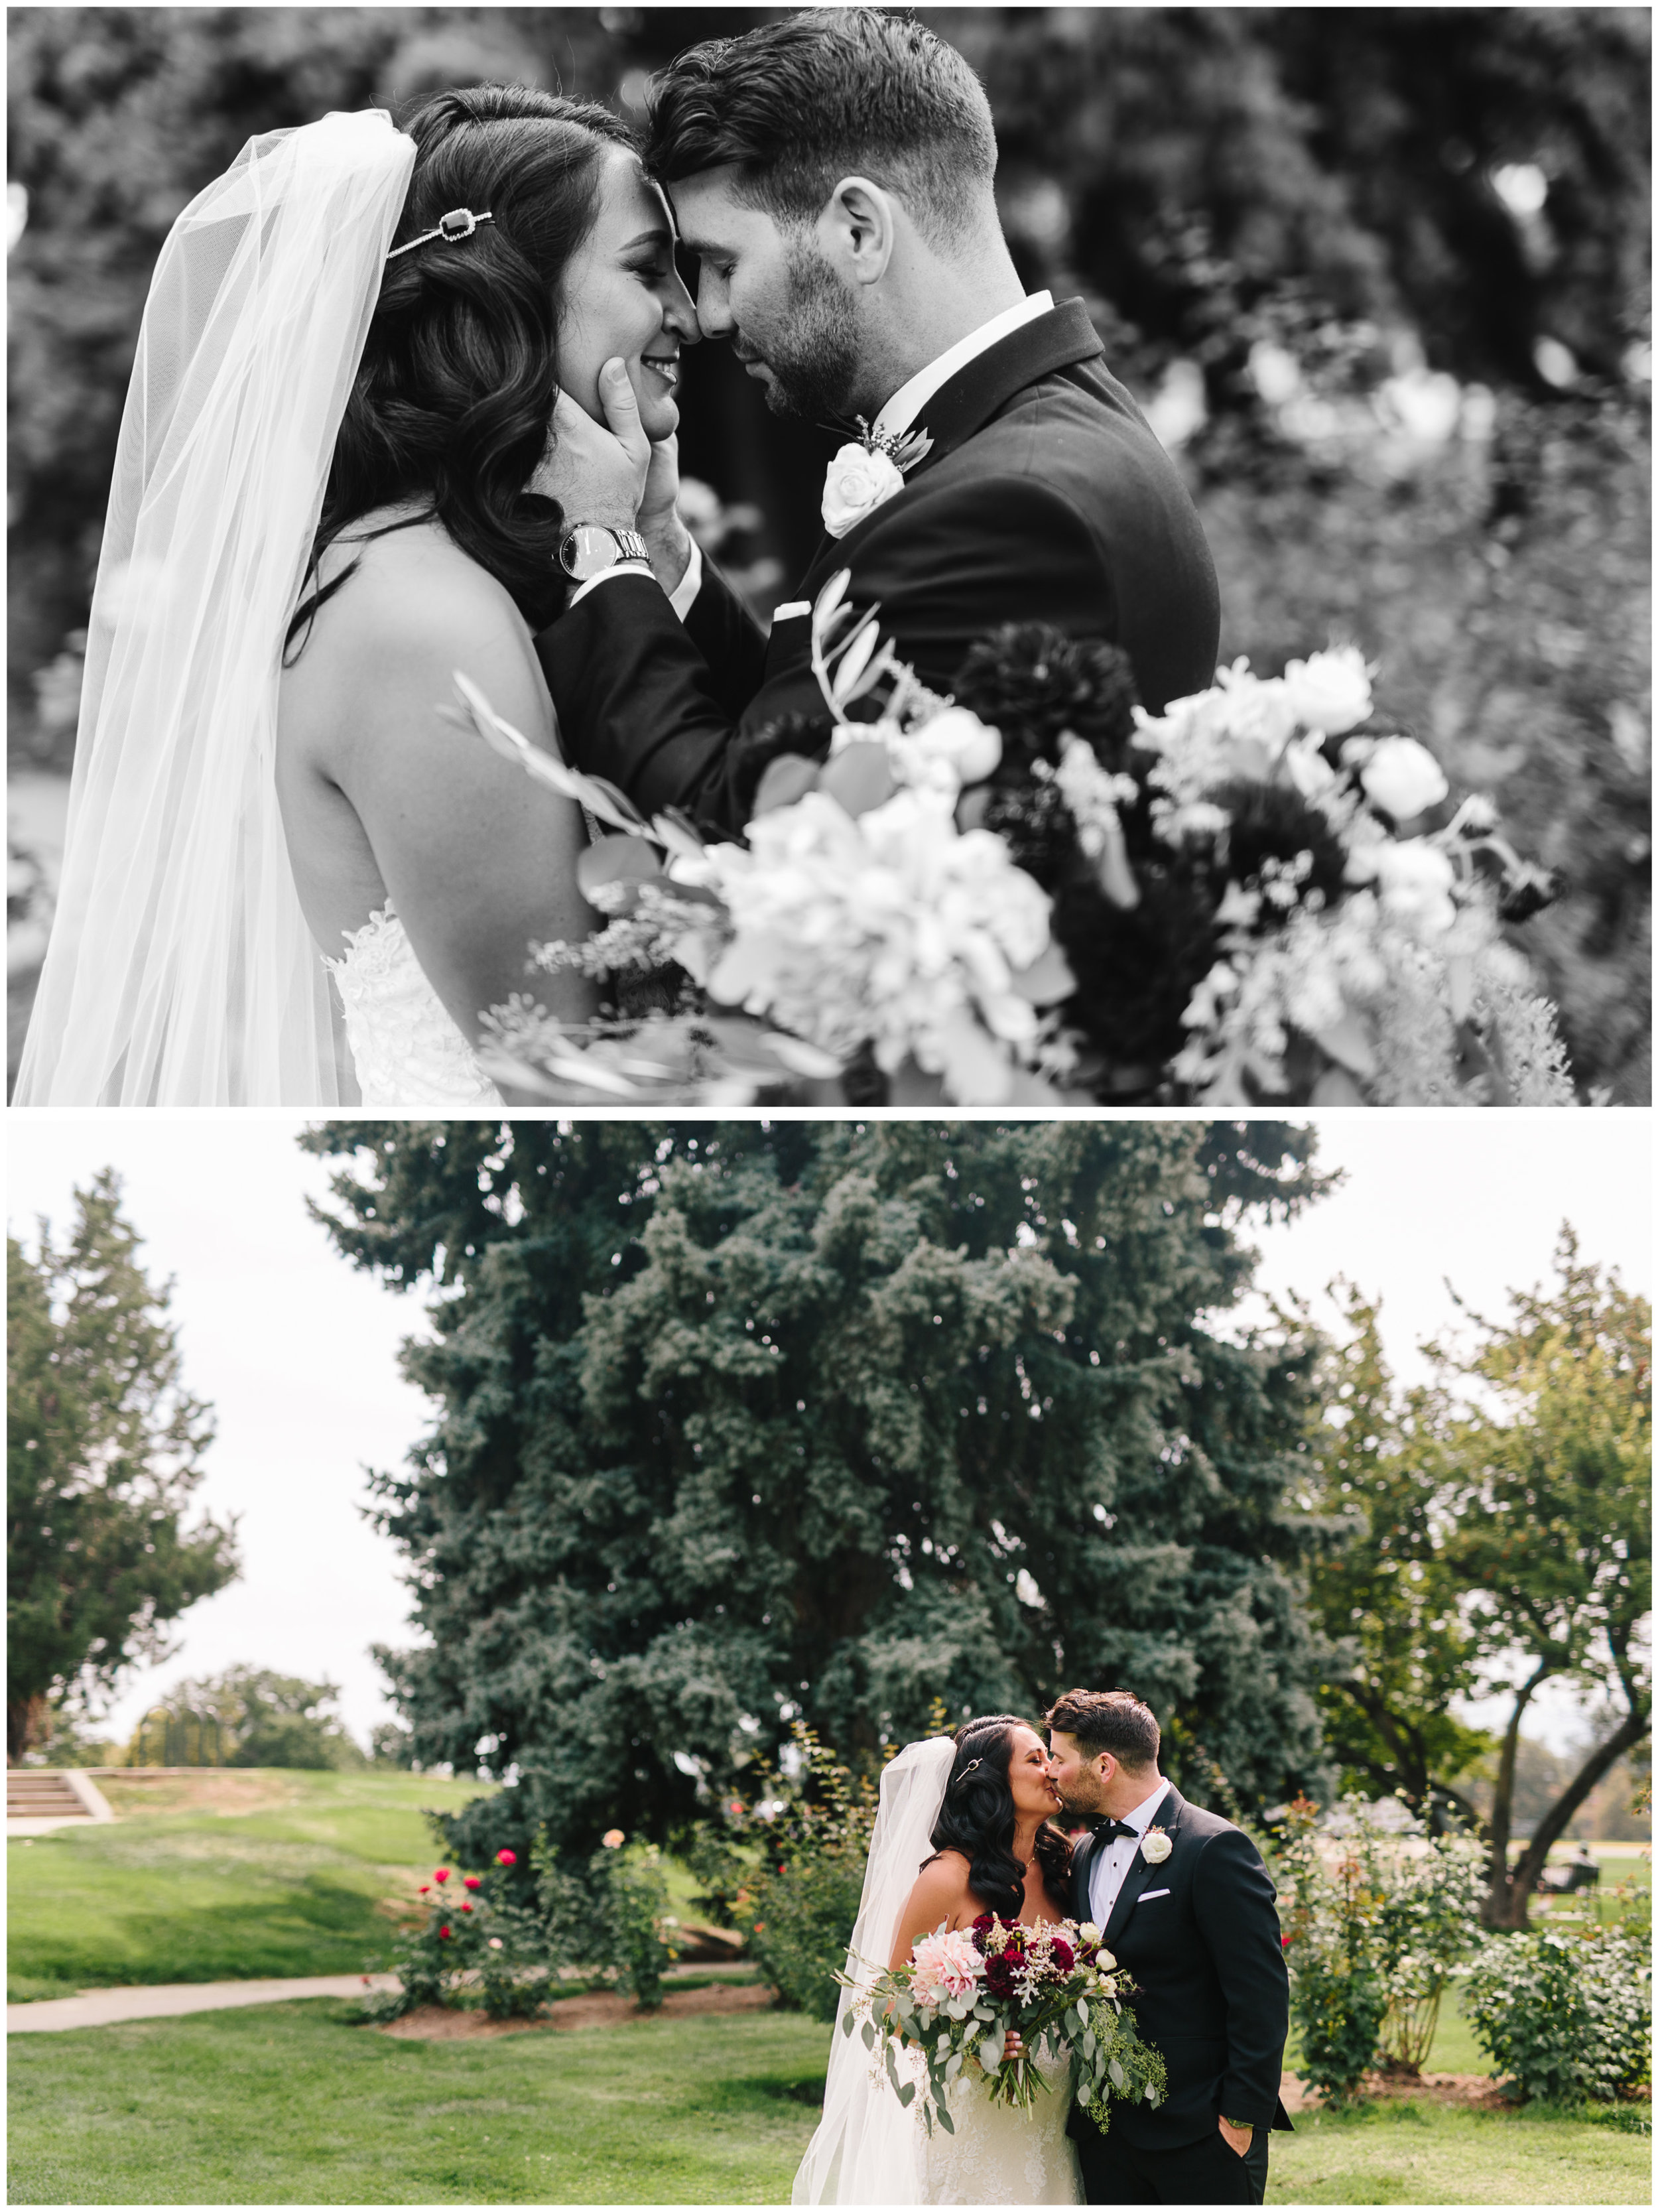 moss_denver_wedding_25.jpg